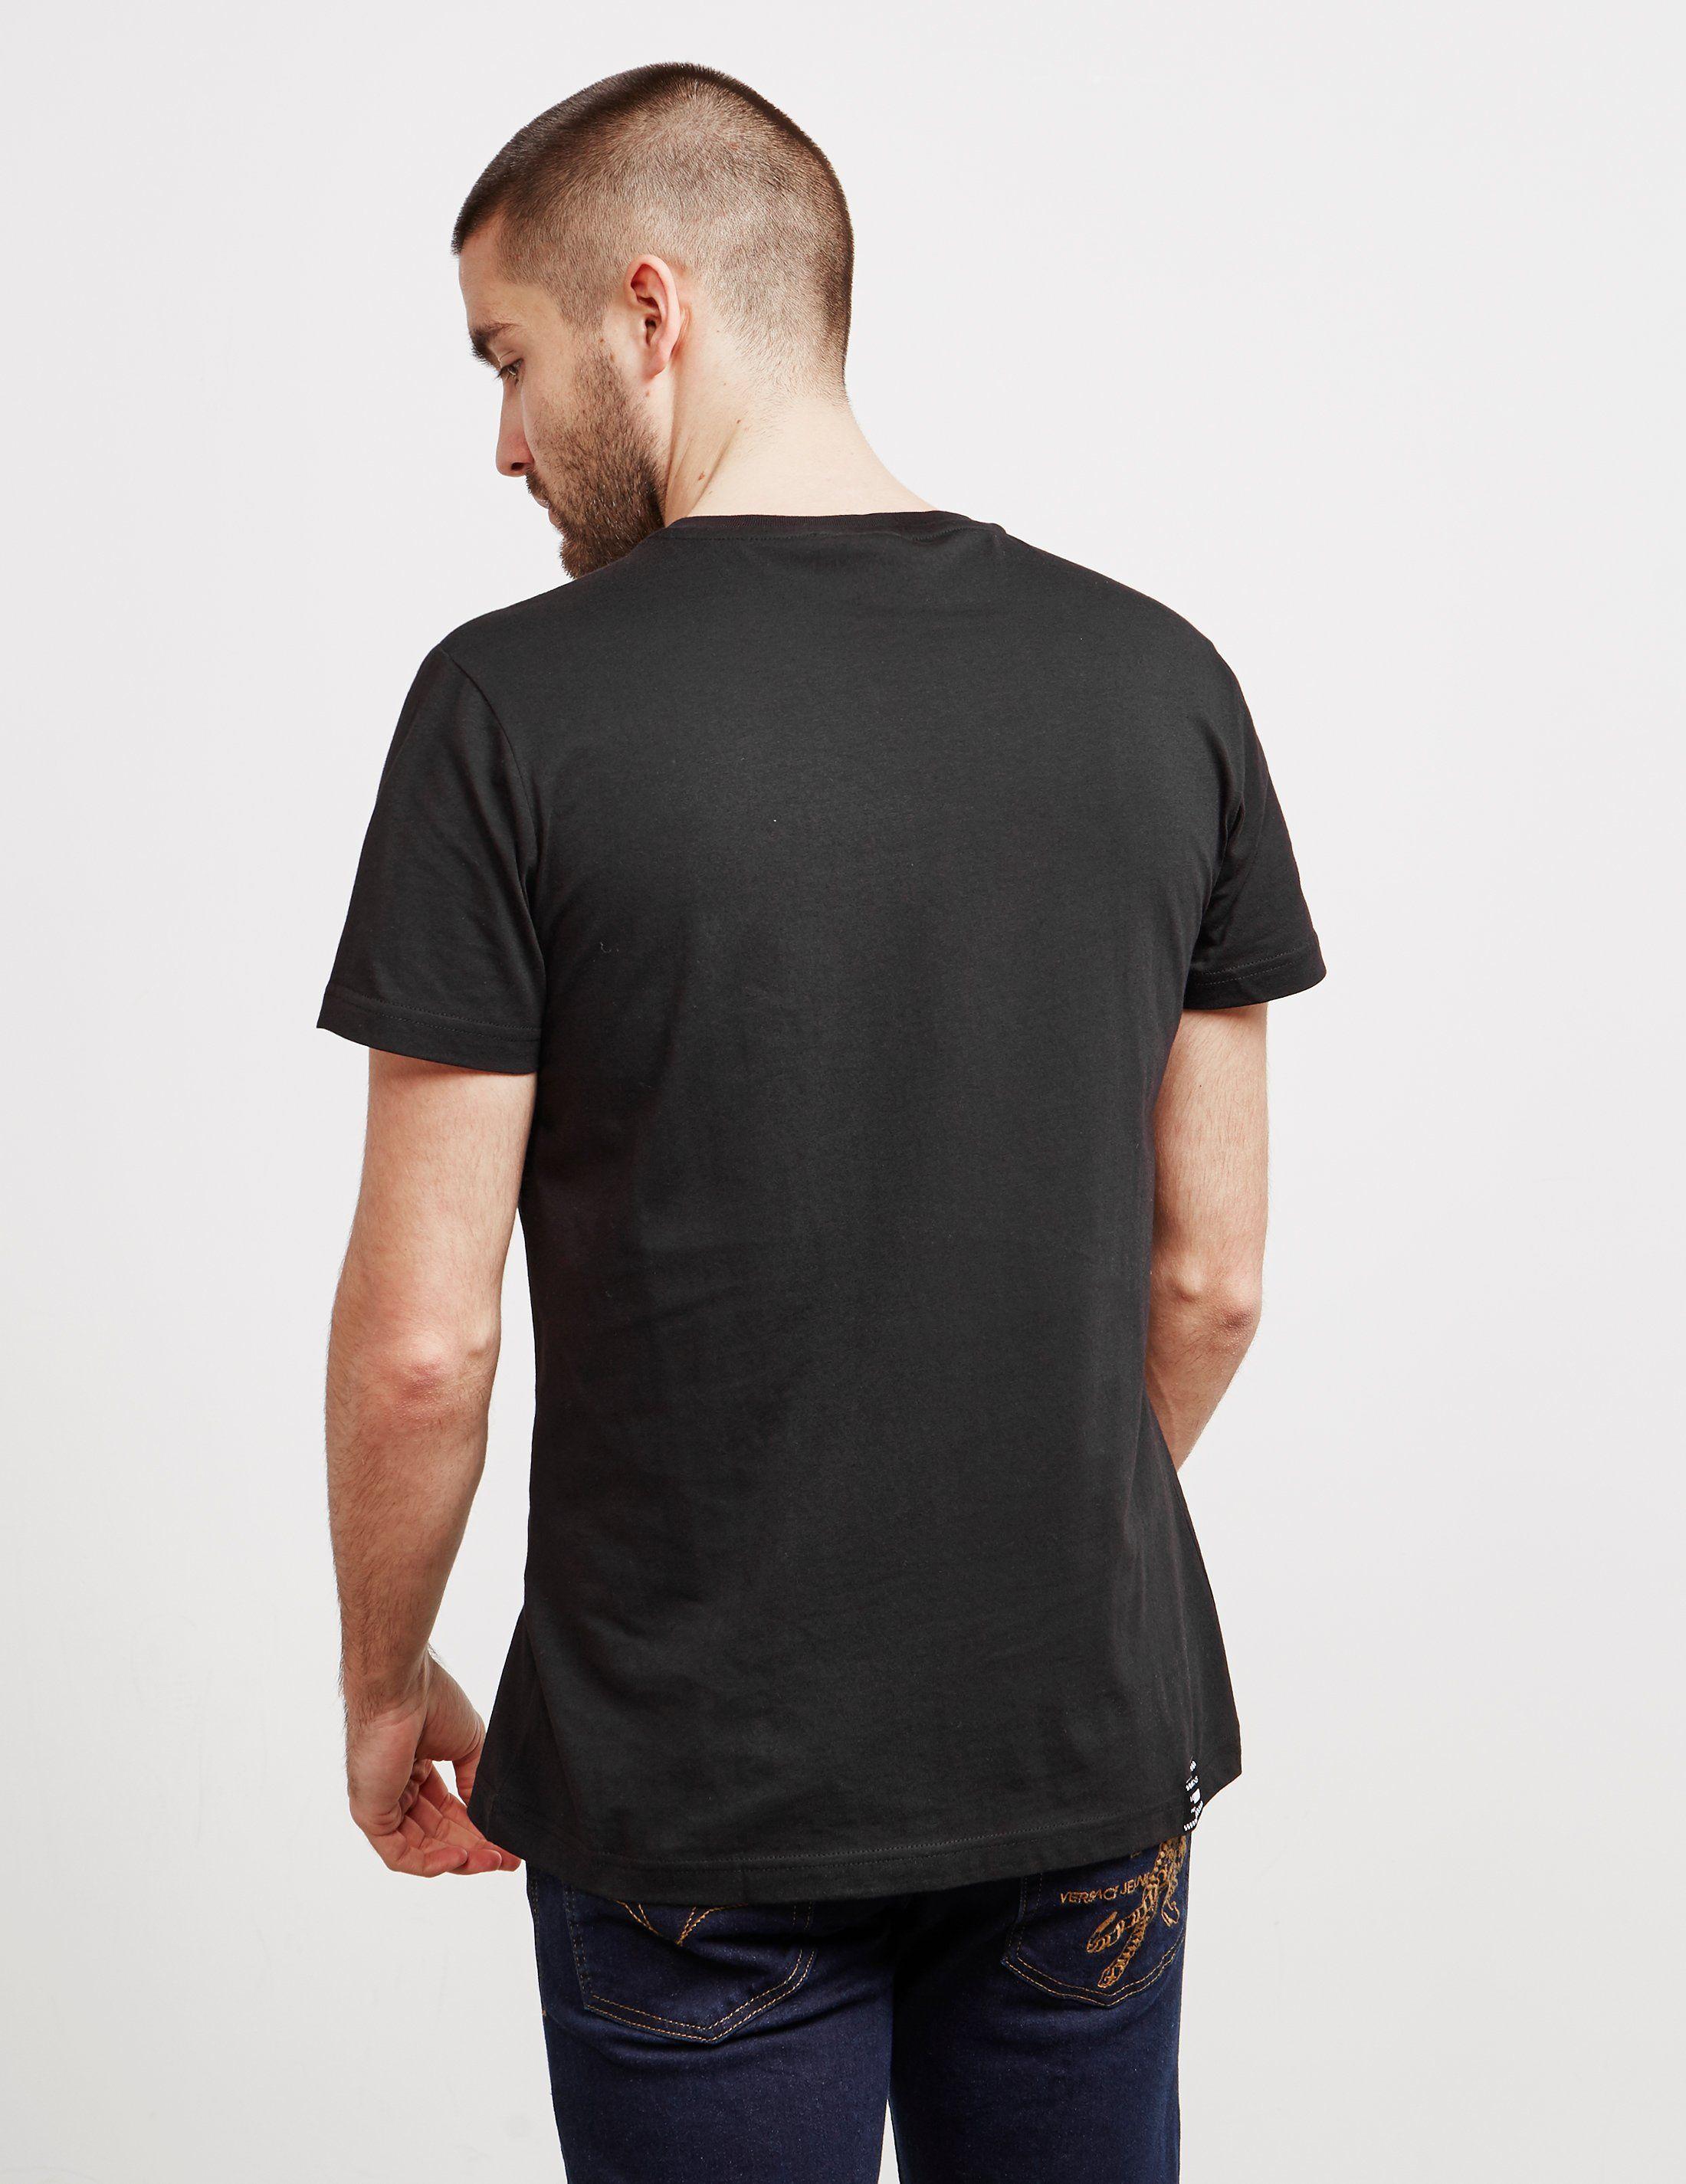 Versace Jeans Small Corp Short Sleeve T-Shirt